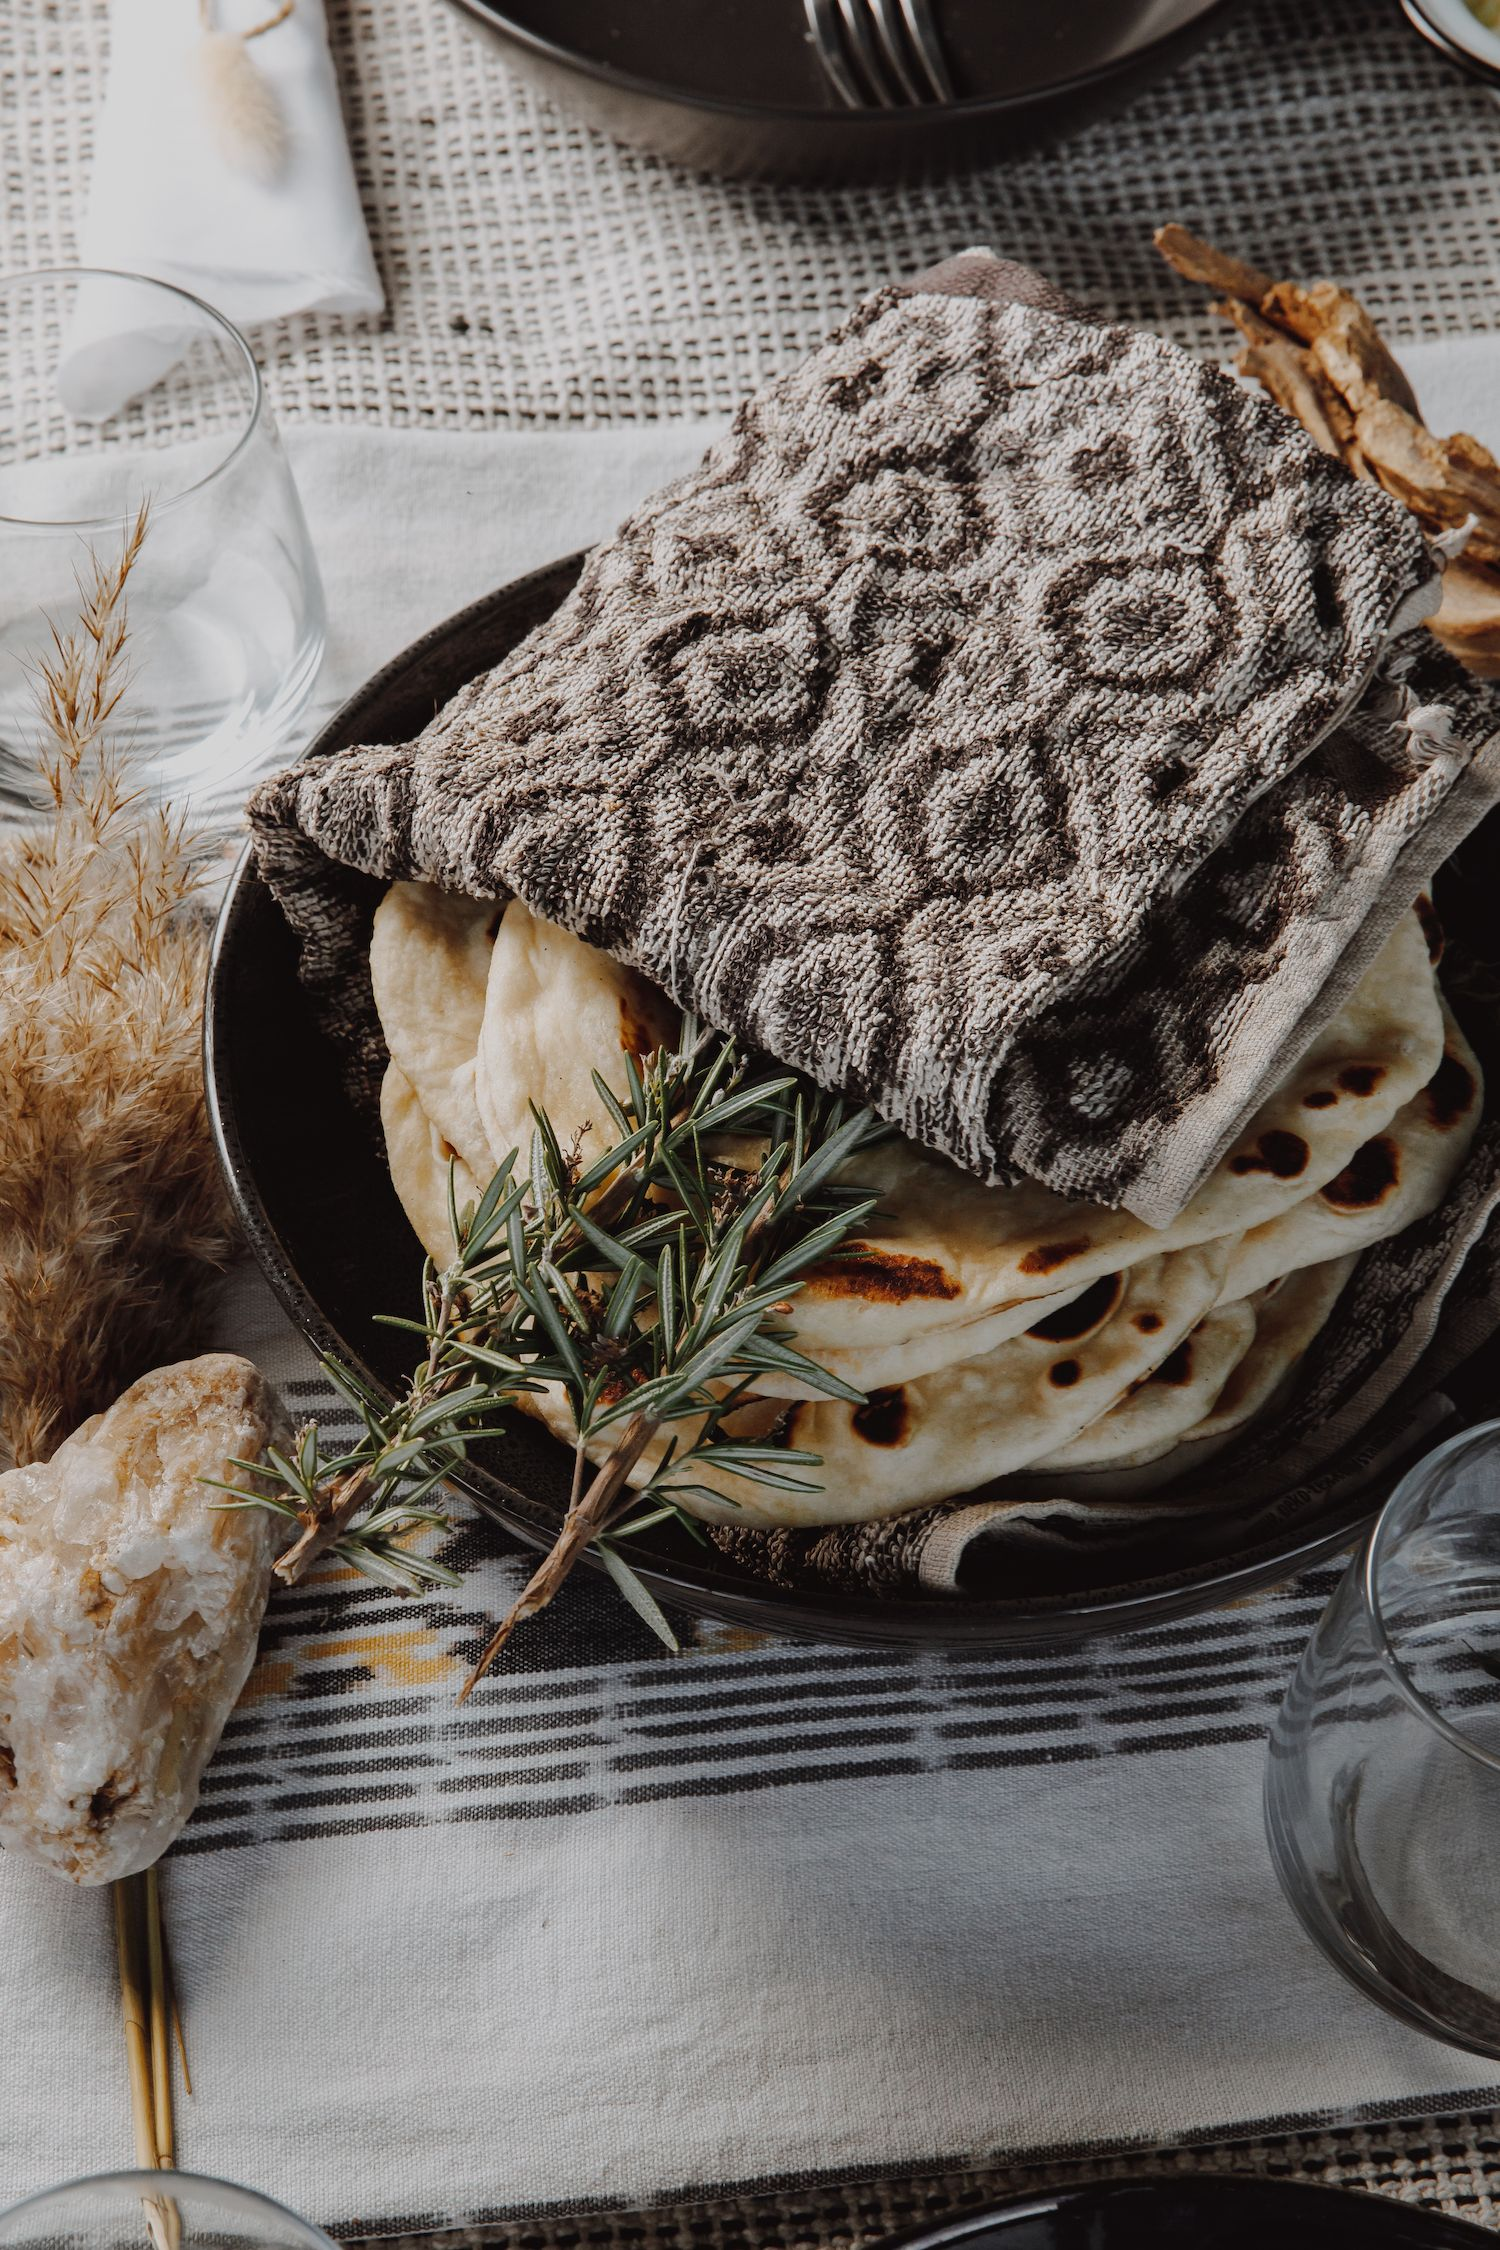 Venison Shwarma flatbread wrapped in a tea-towel